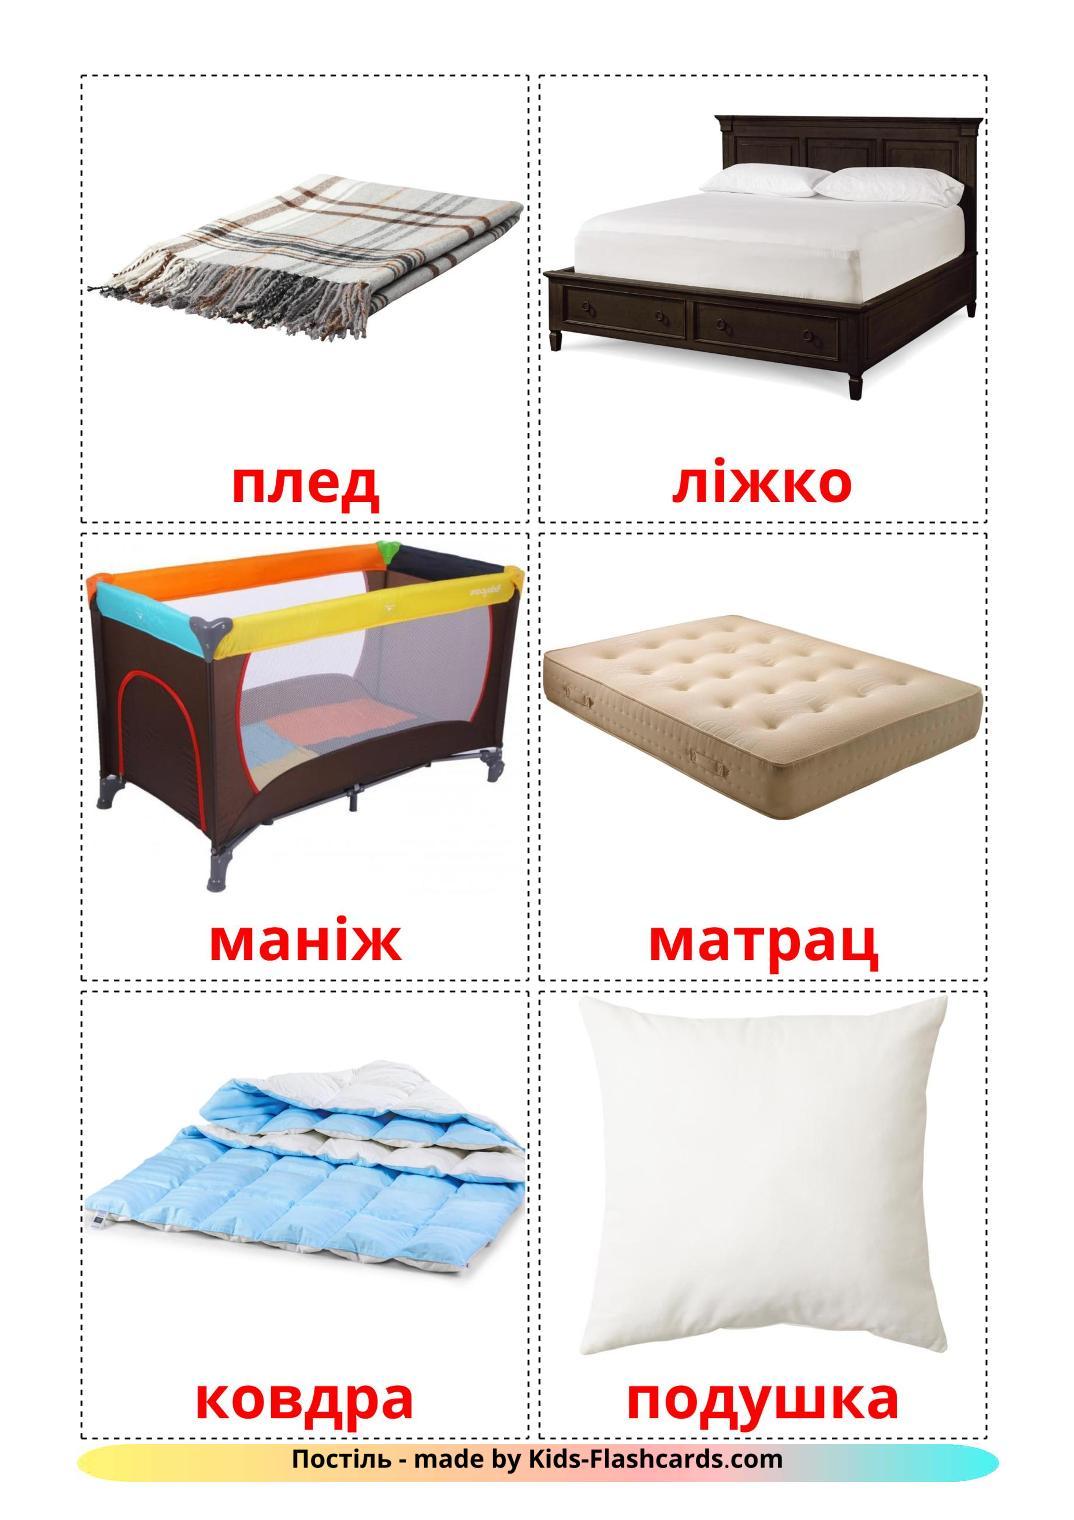 Bed - 15 Free Printable ukrainian Flashcards